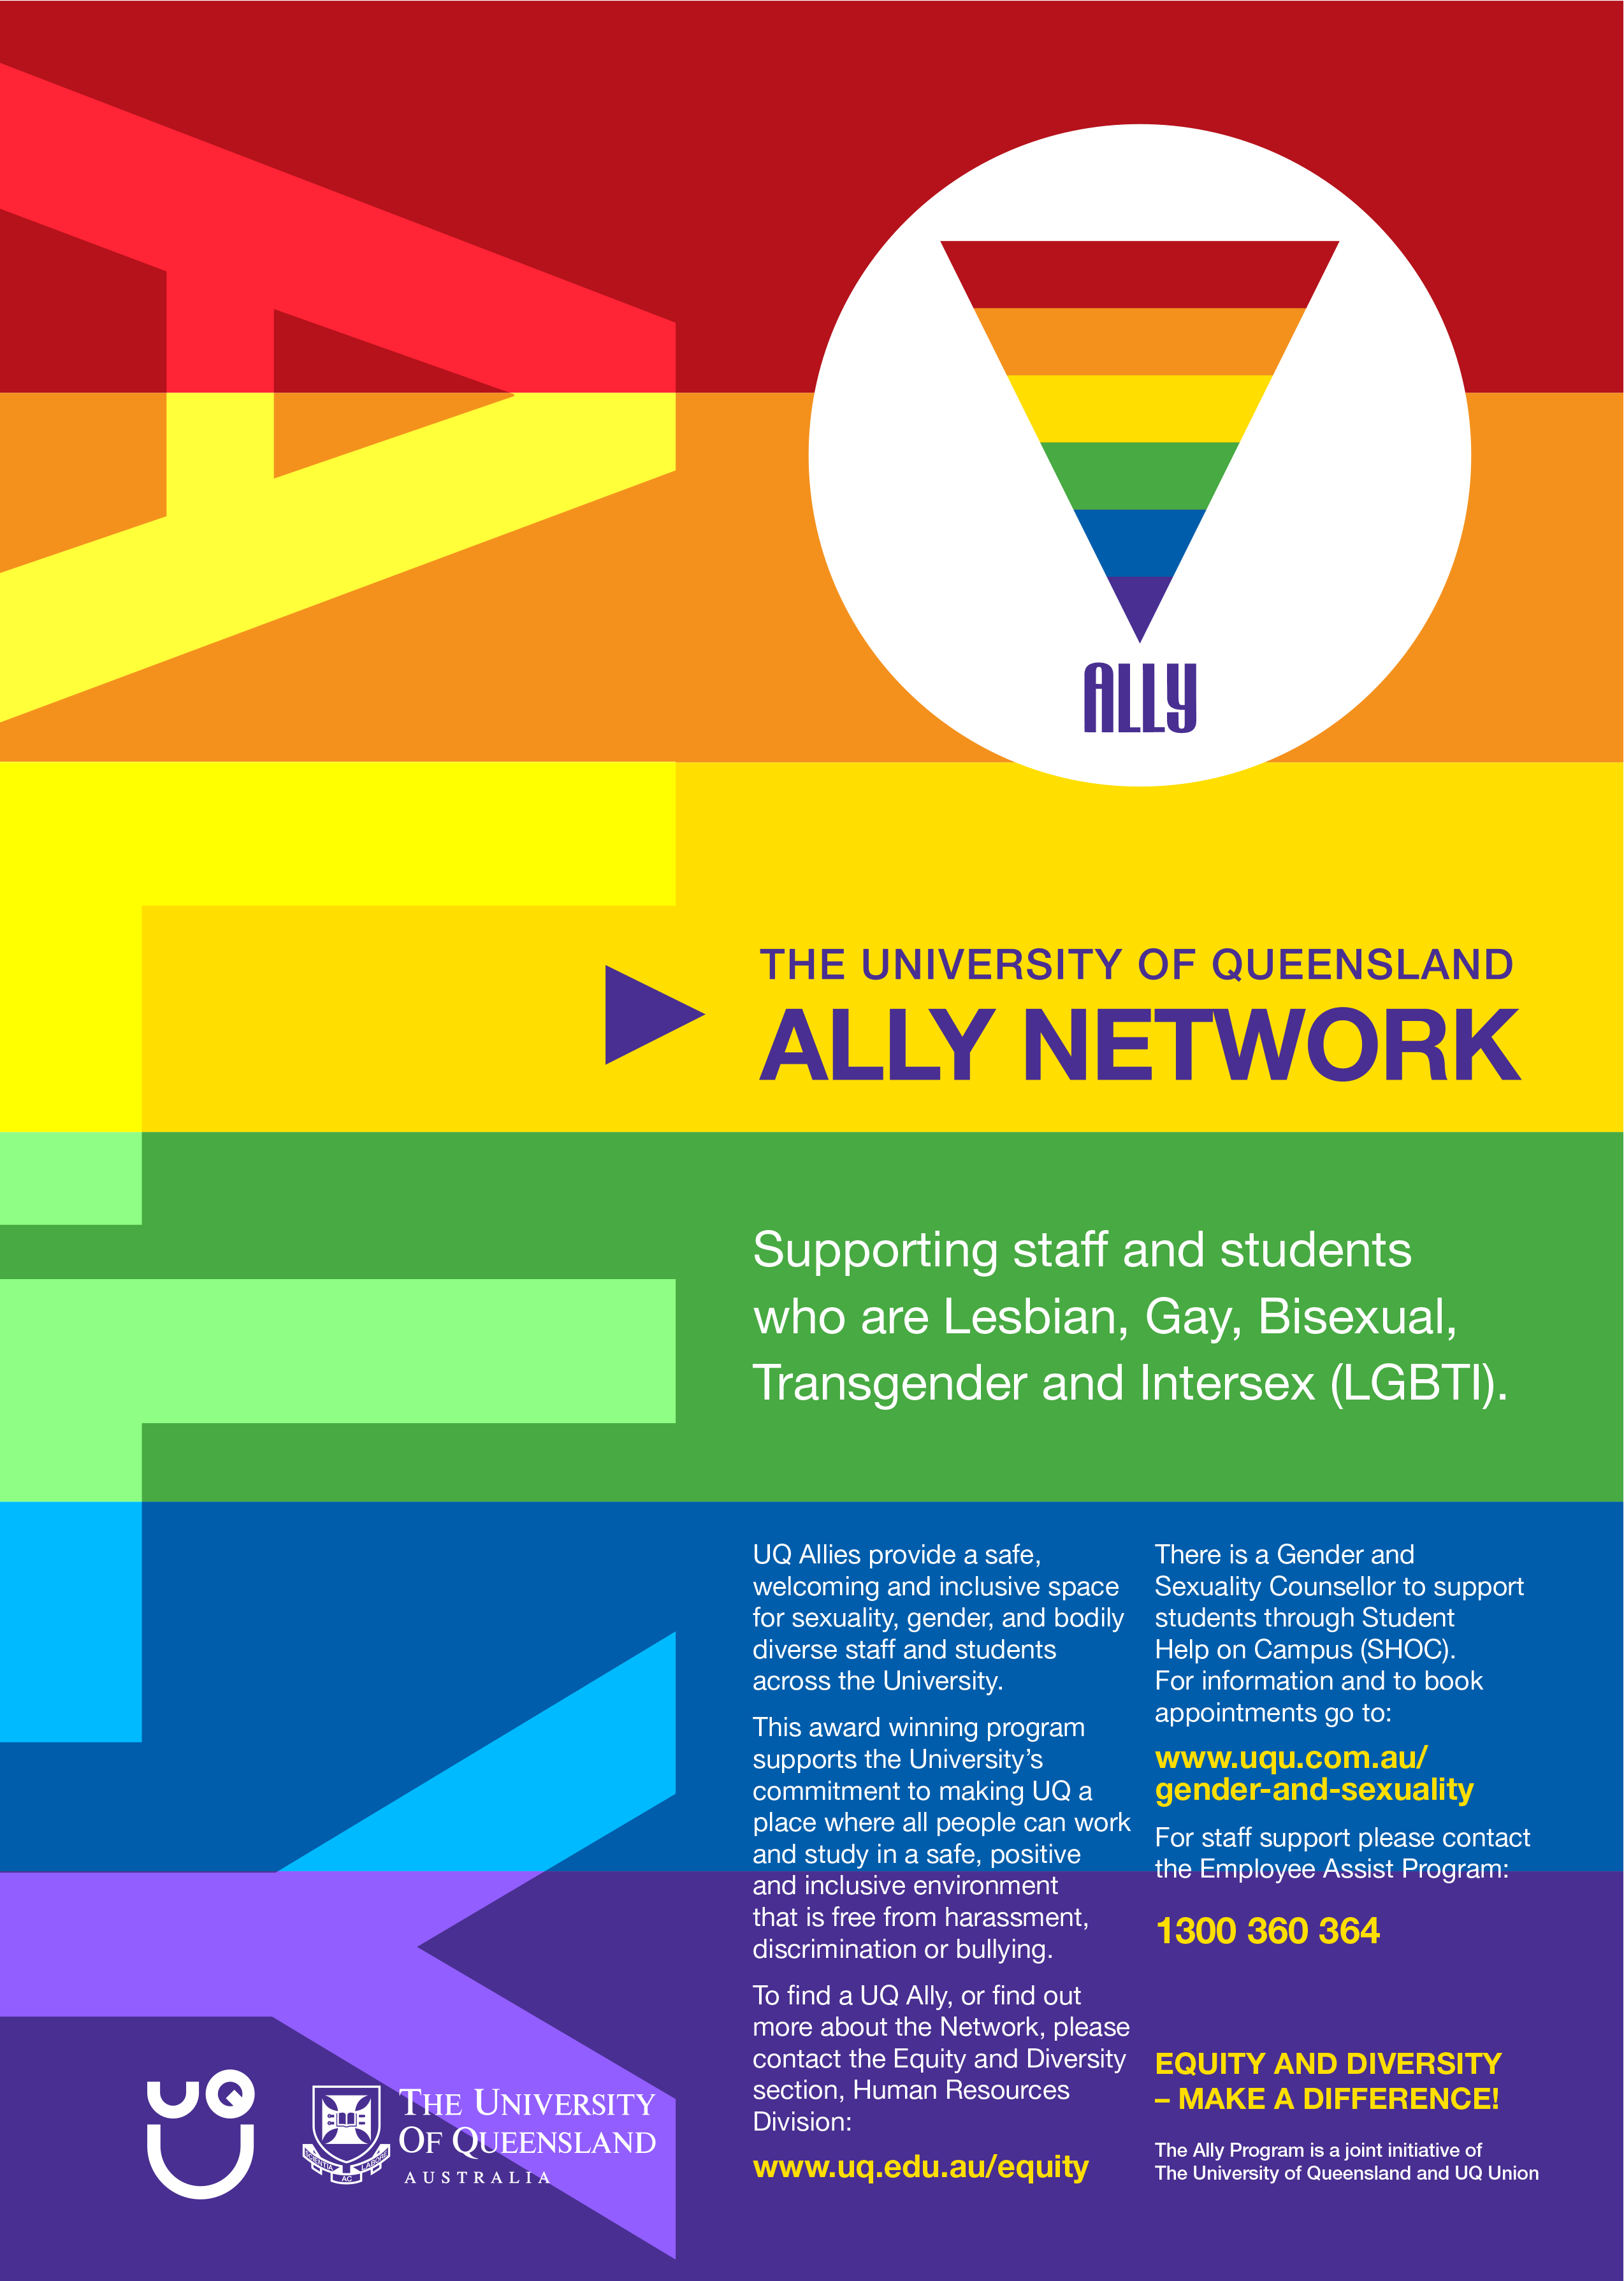 LGBTI, inclusion, diversity